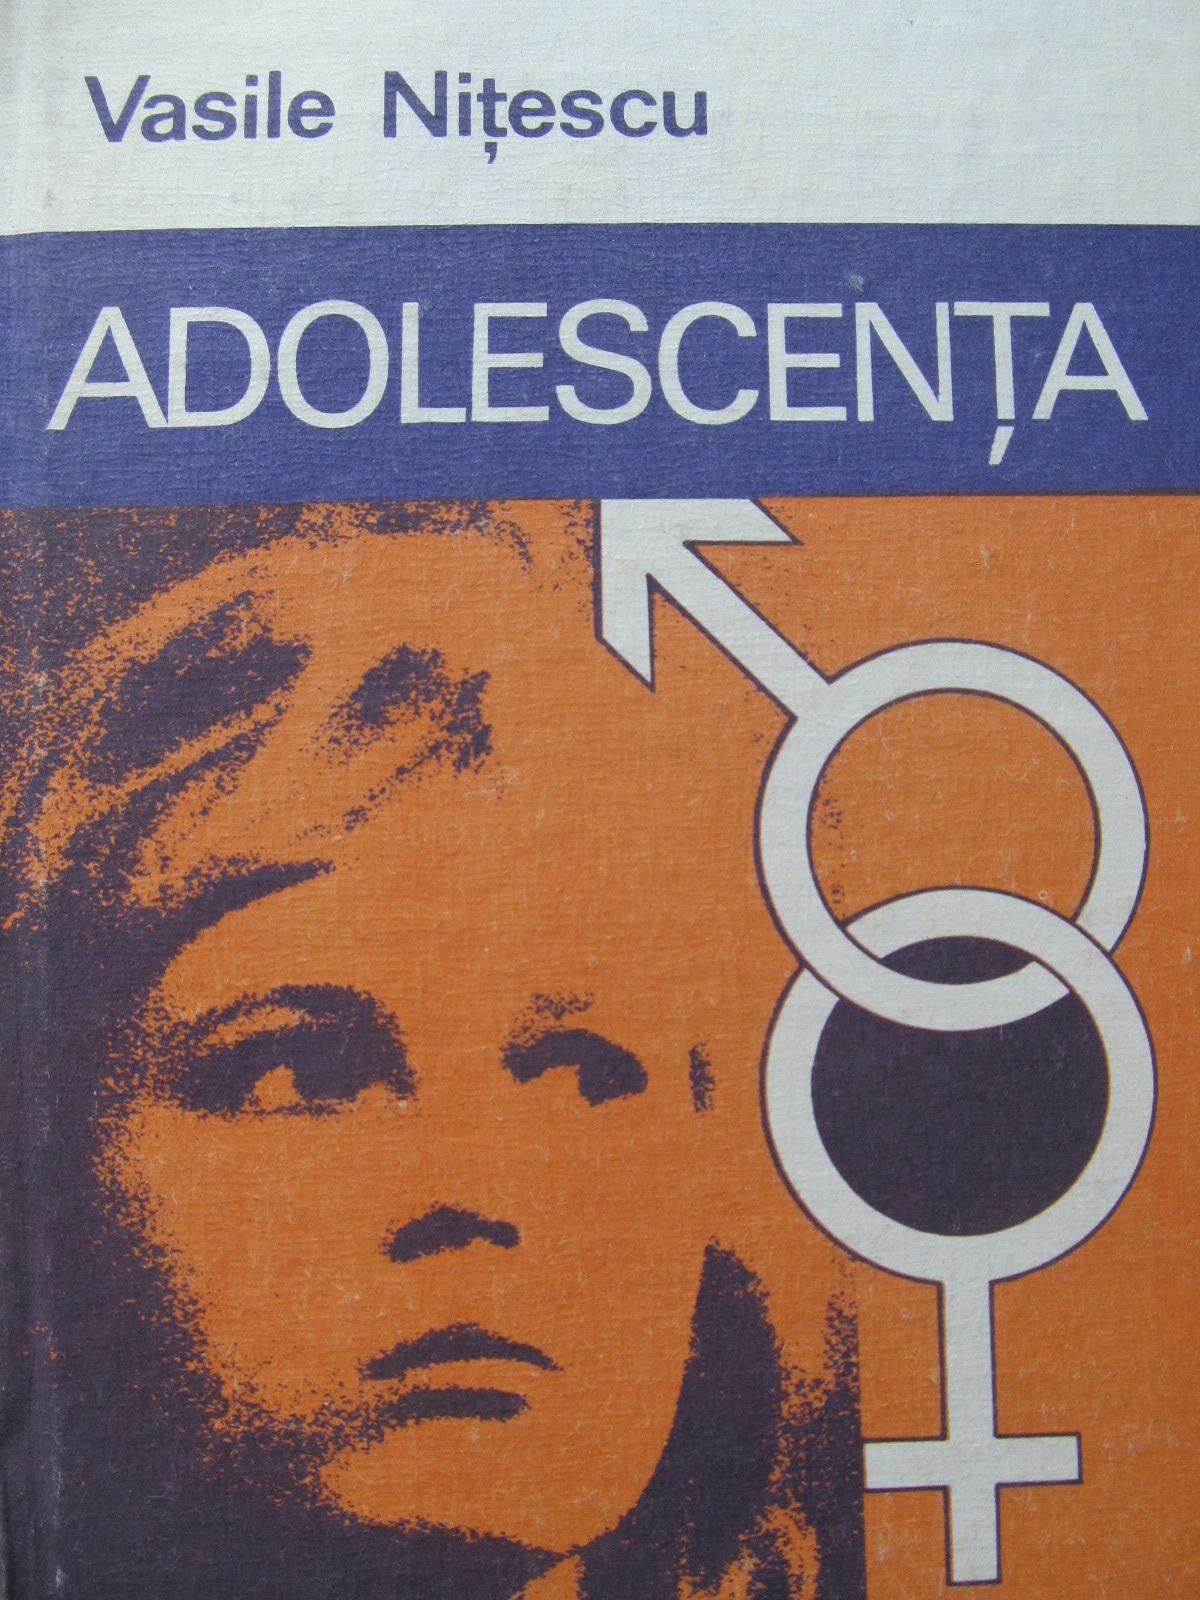 Adolescenta - Vasile Nitescu   Detalii carte